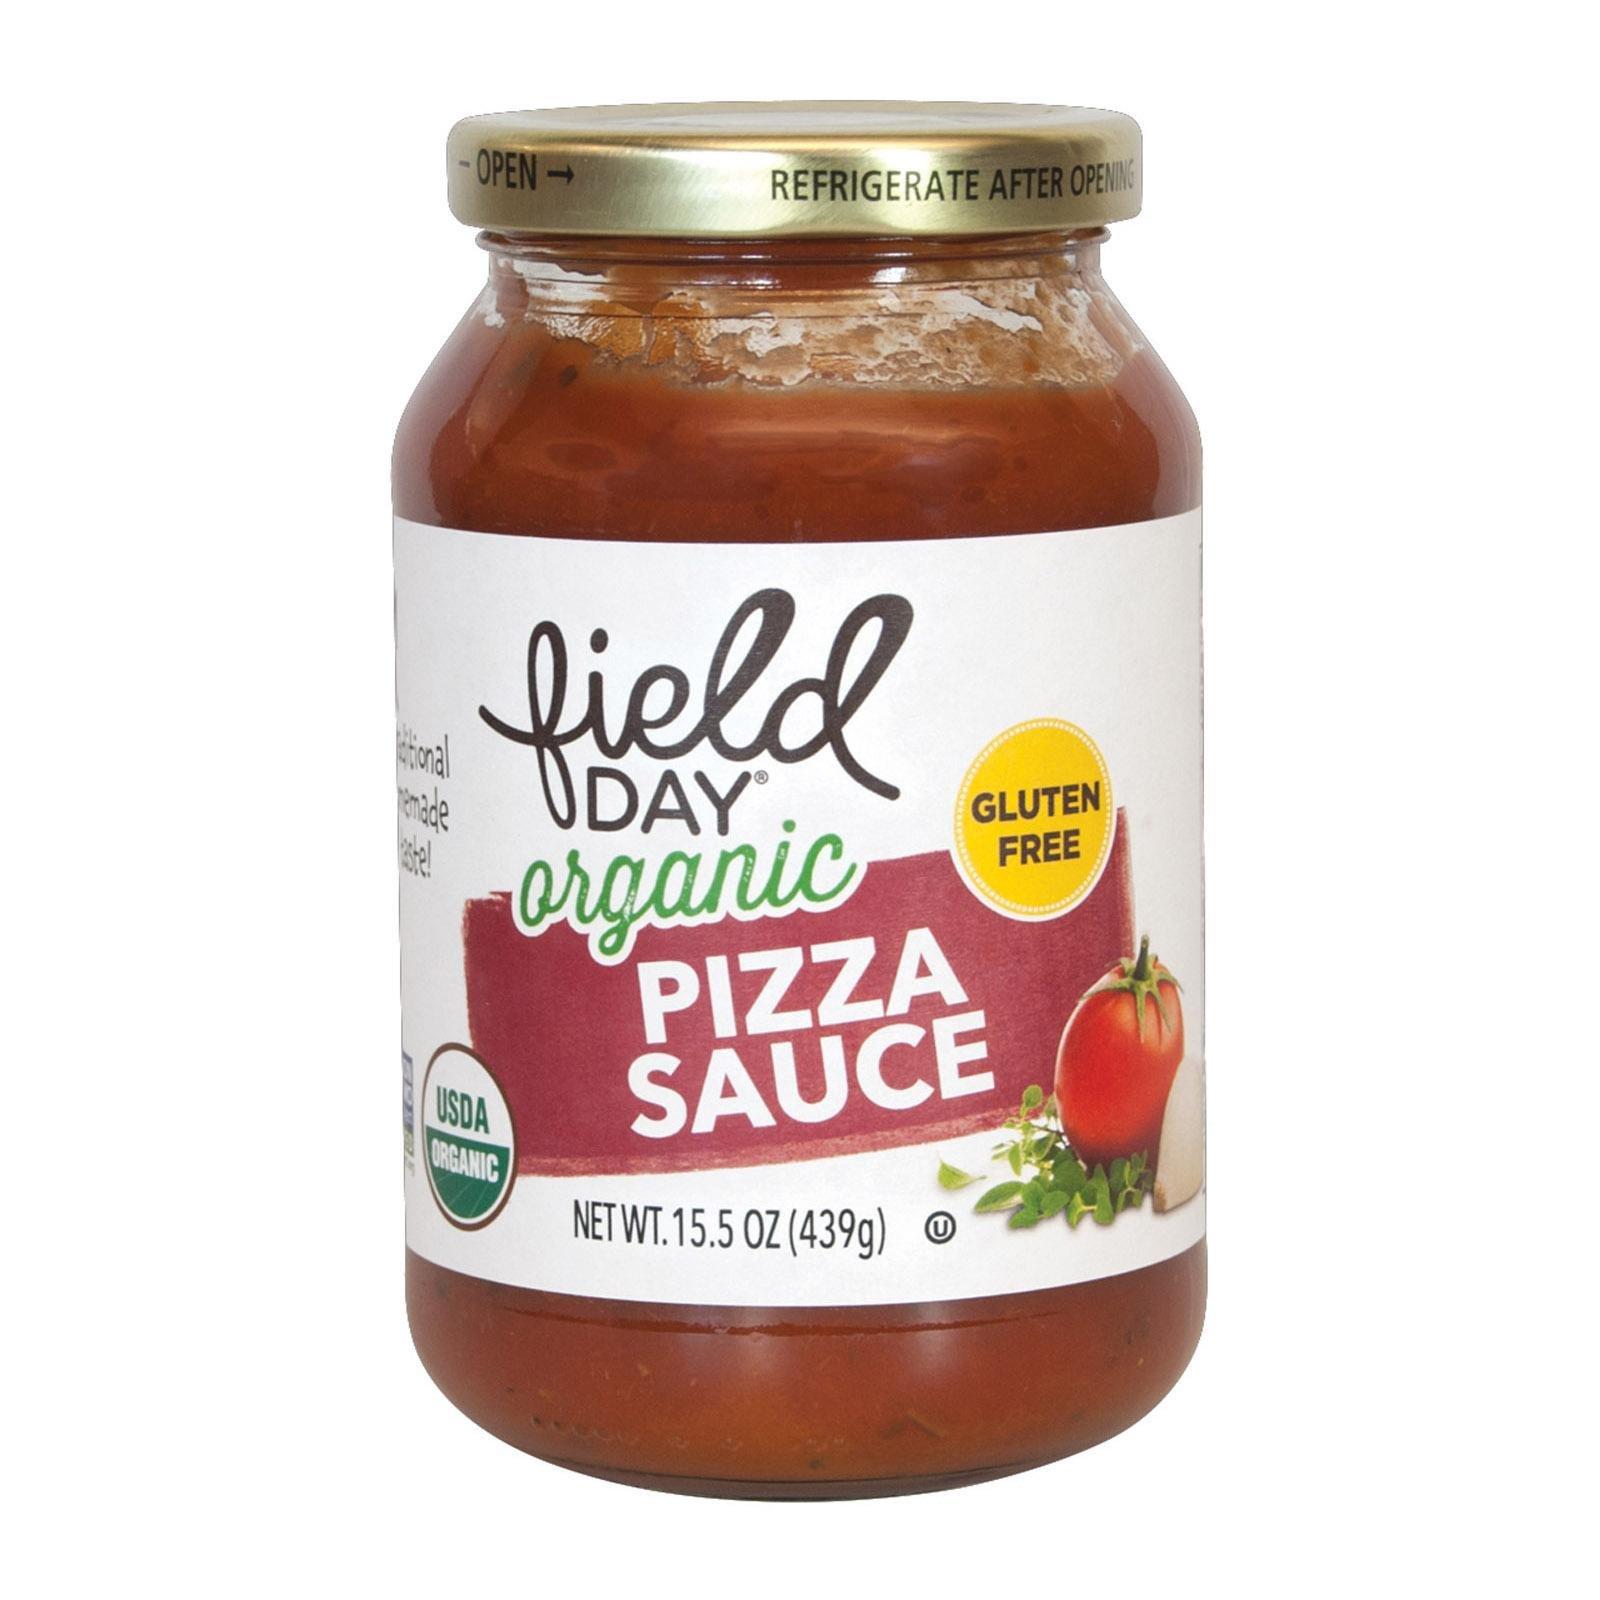 Field Day Organic Pizza Sauce, 15.5 Ounce